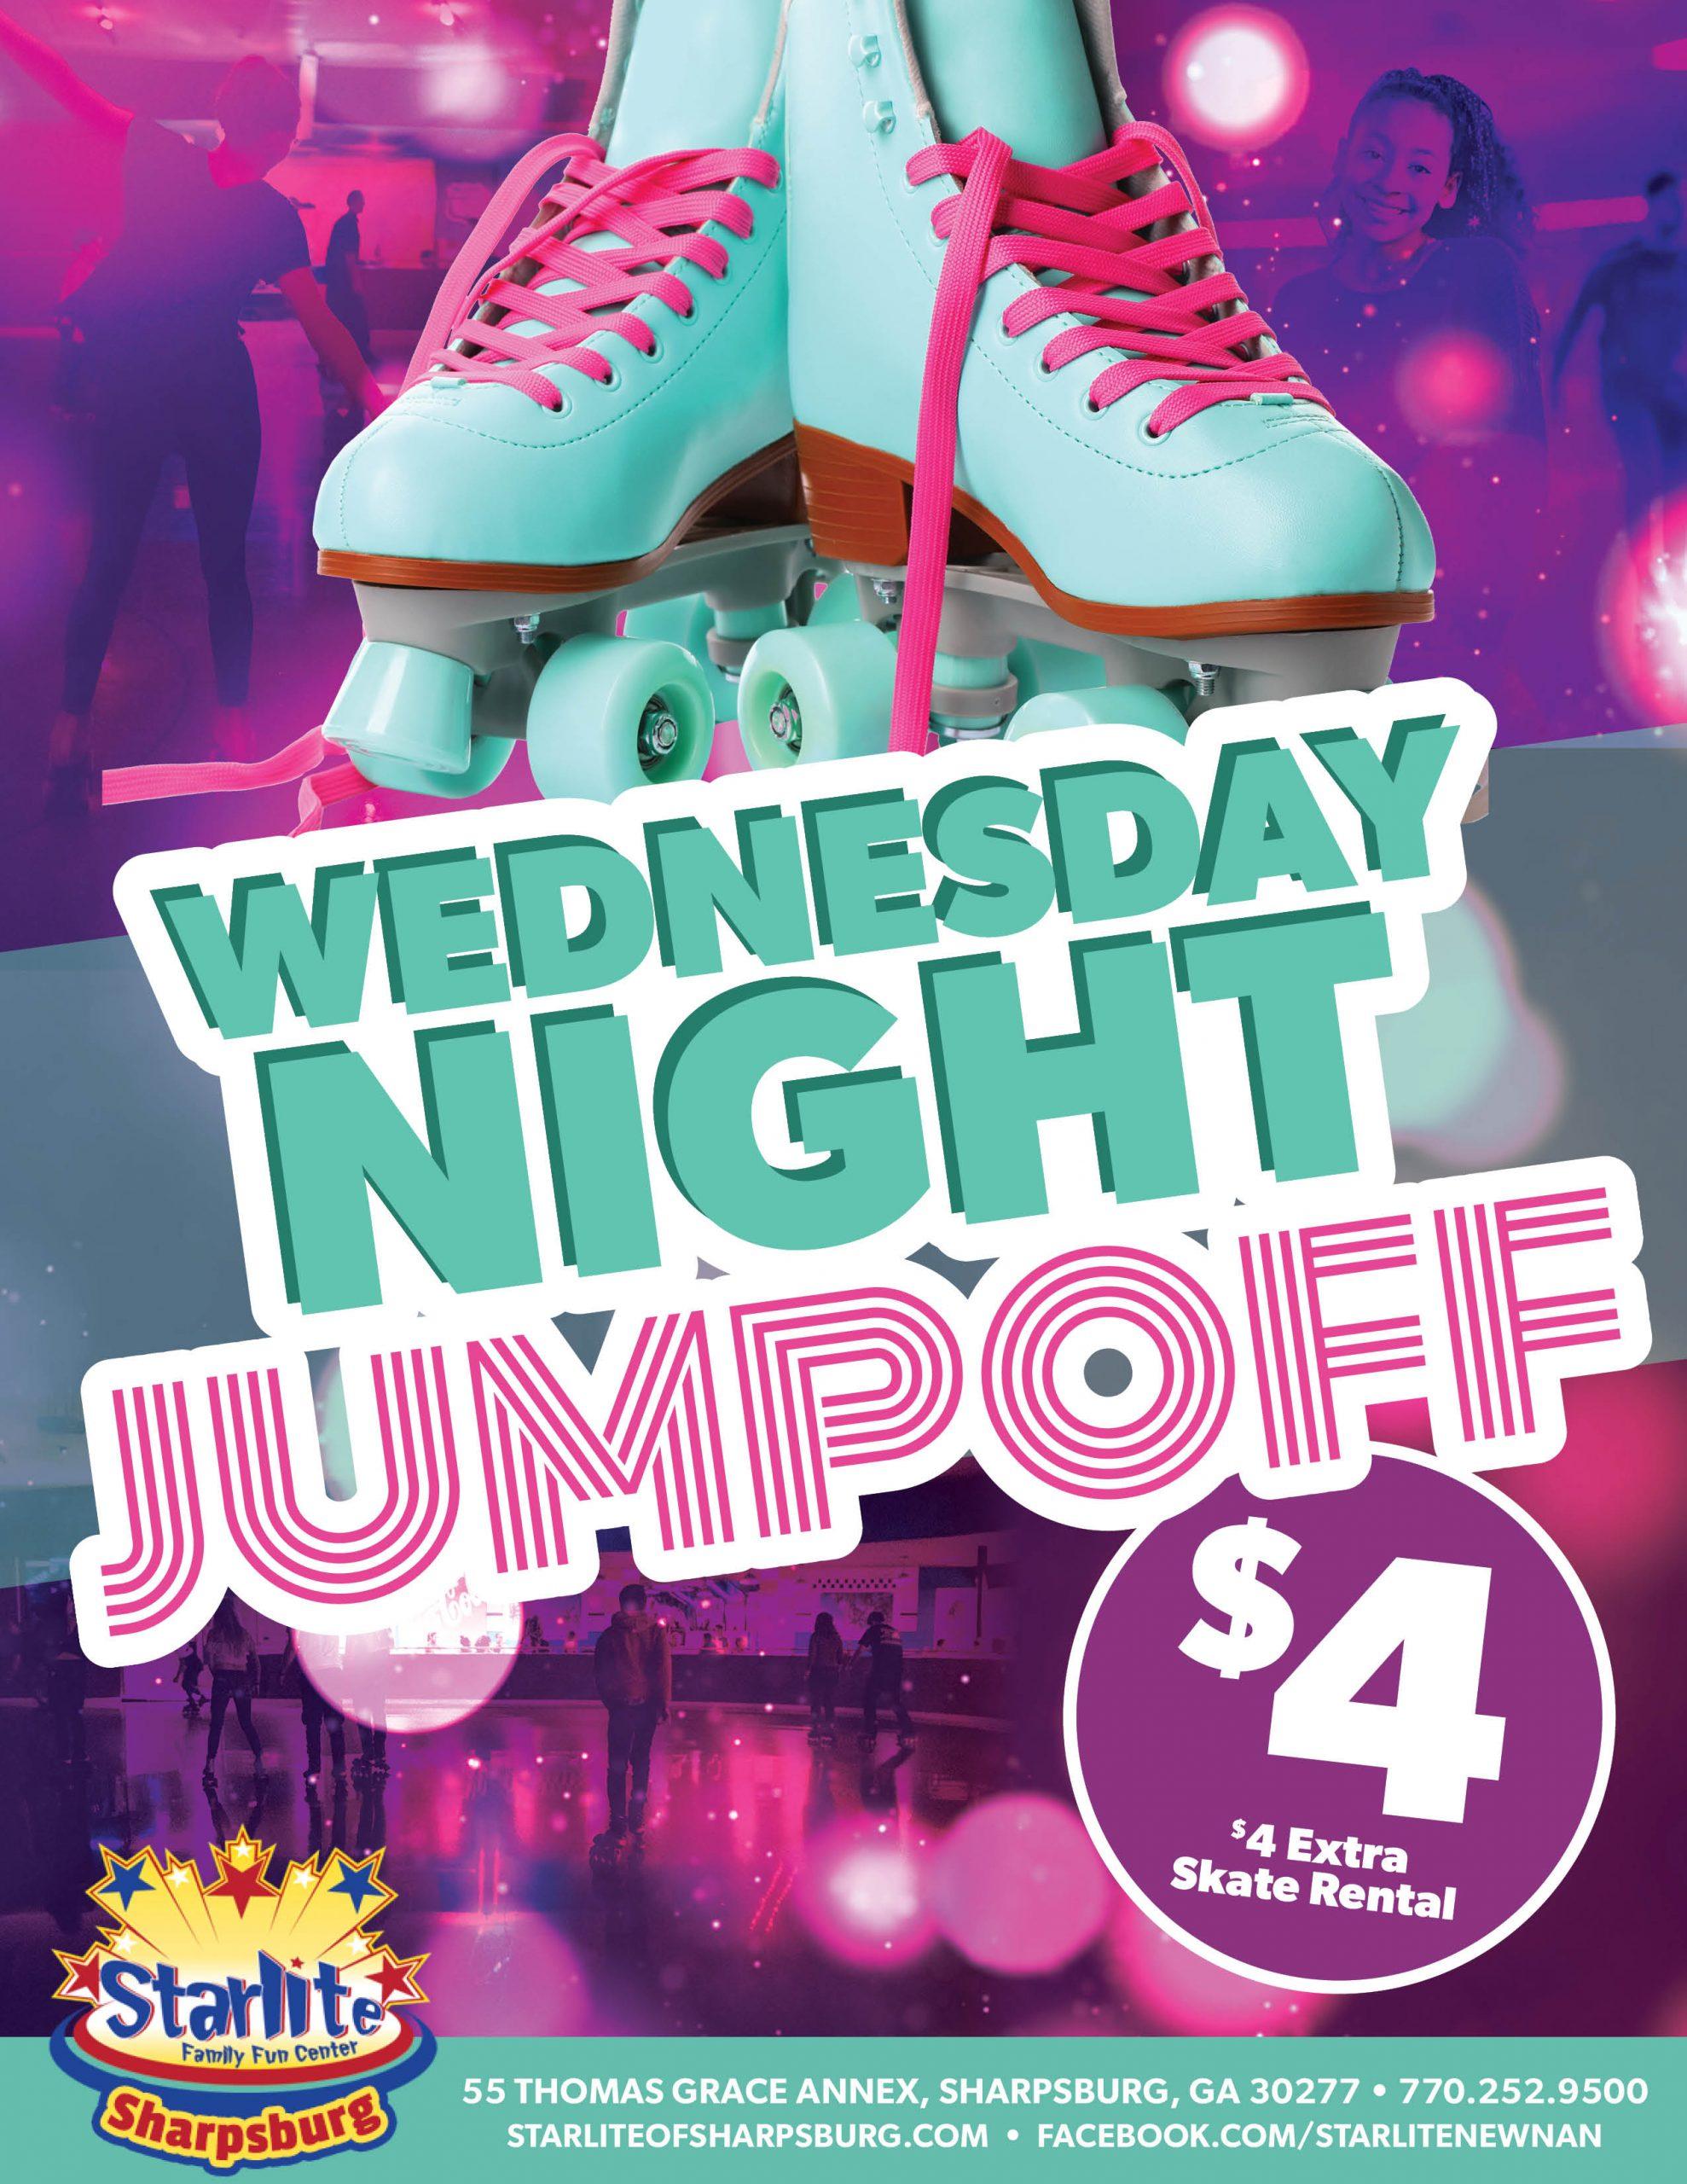 GA21-007 Wednesday Night Jumpoff-Sharpsburg